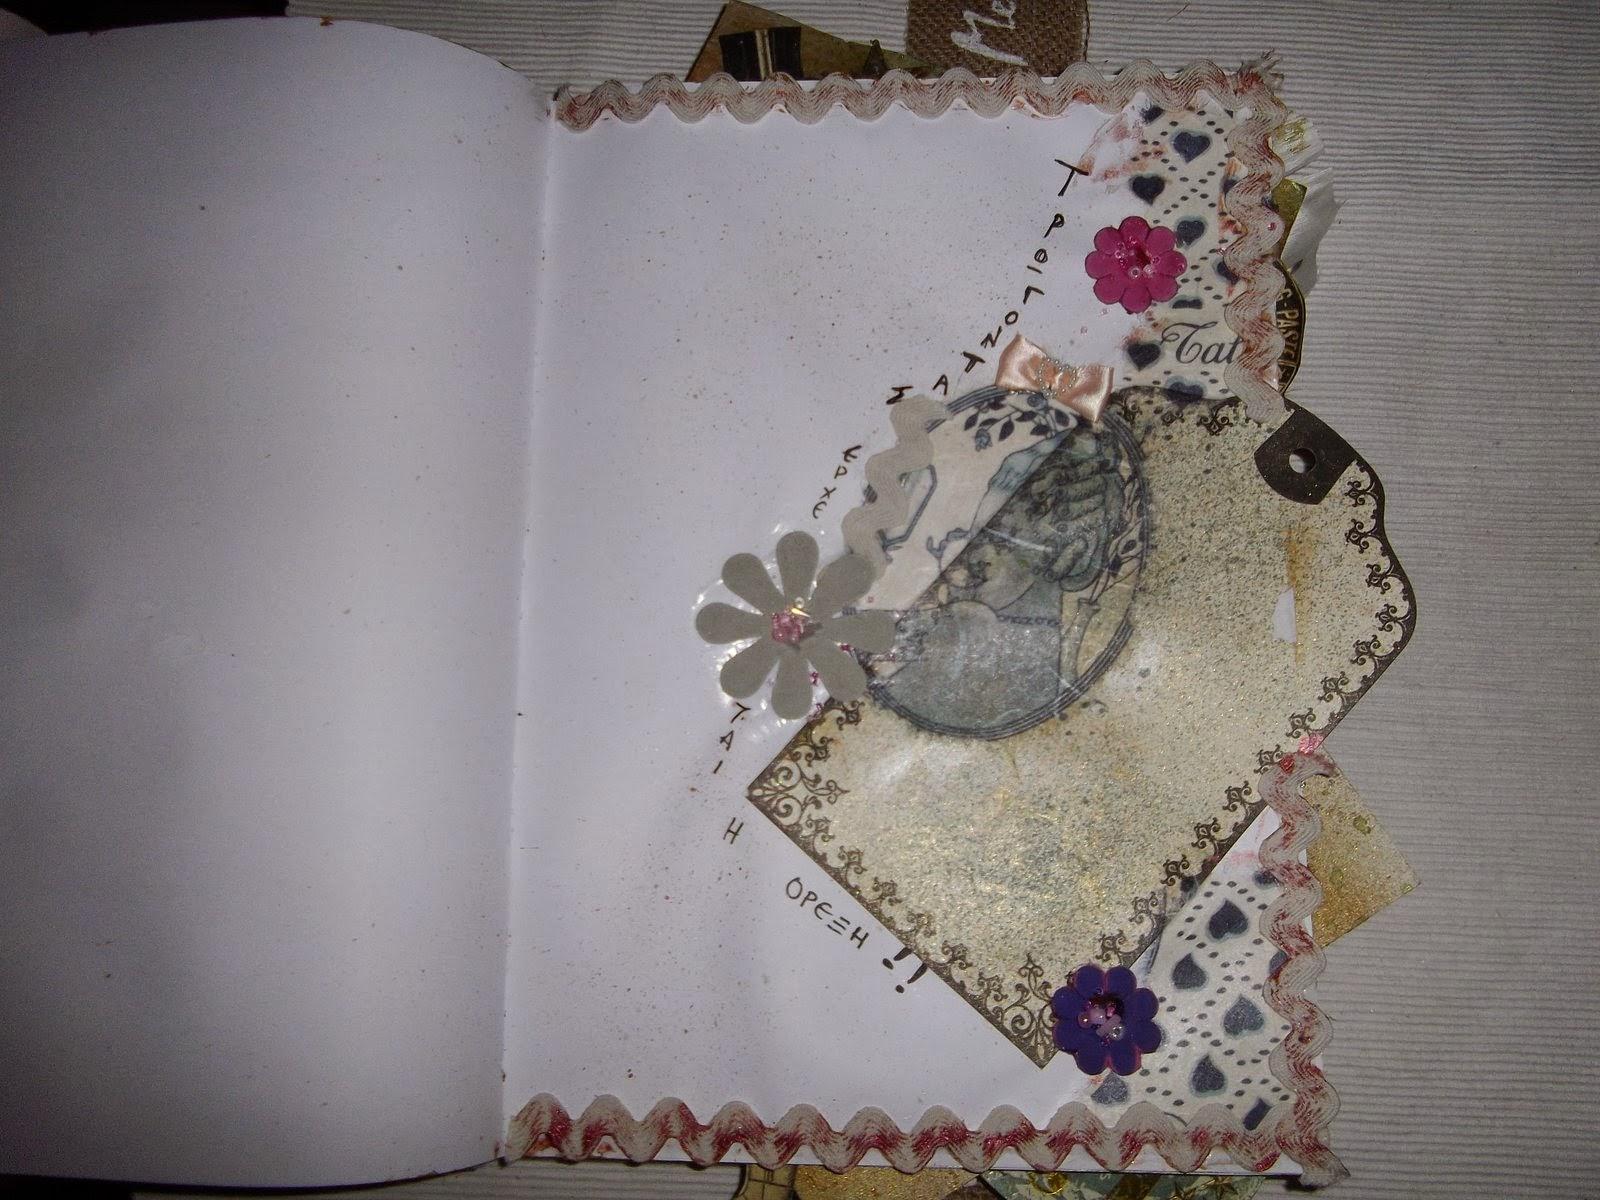 71fe6077a63 Amanda's Handmade Creations: Χειροποίητο βιβλίο συνταγών, κοσμημένο ...